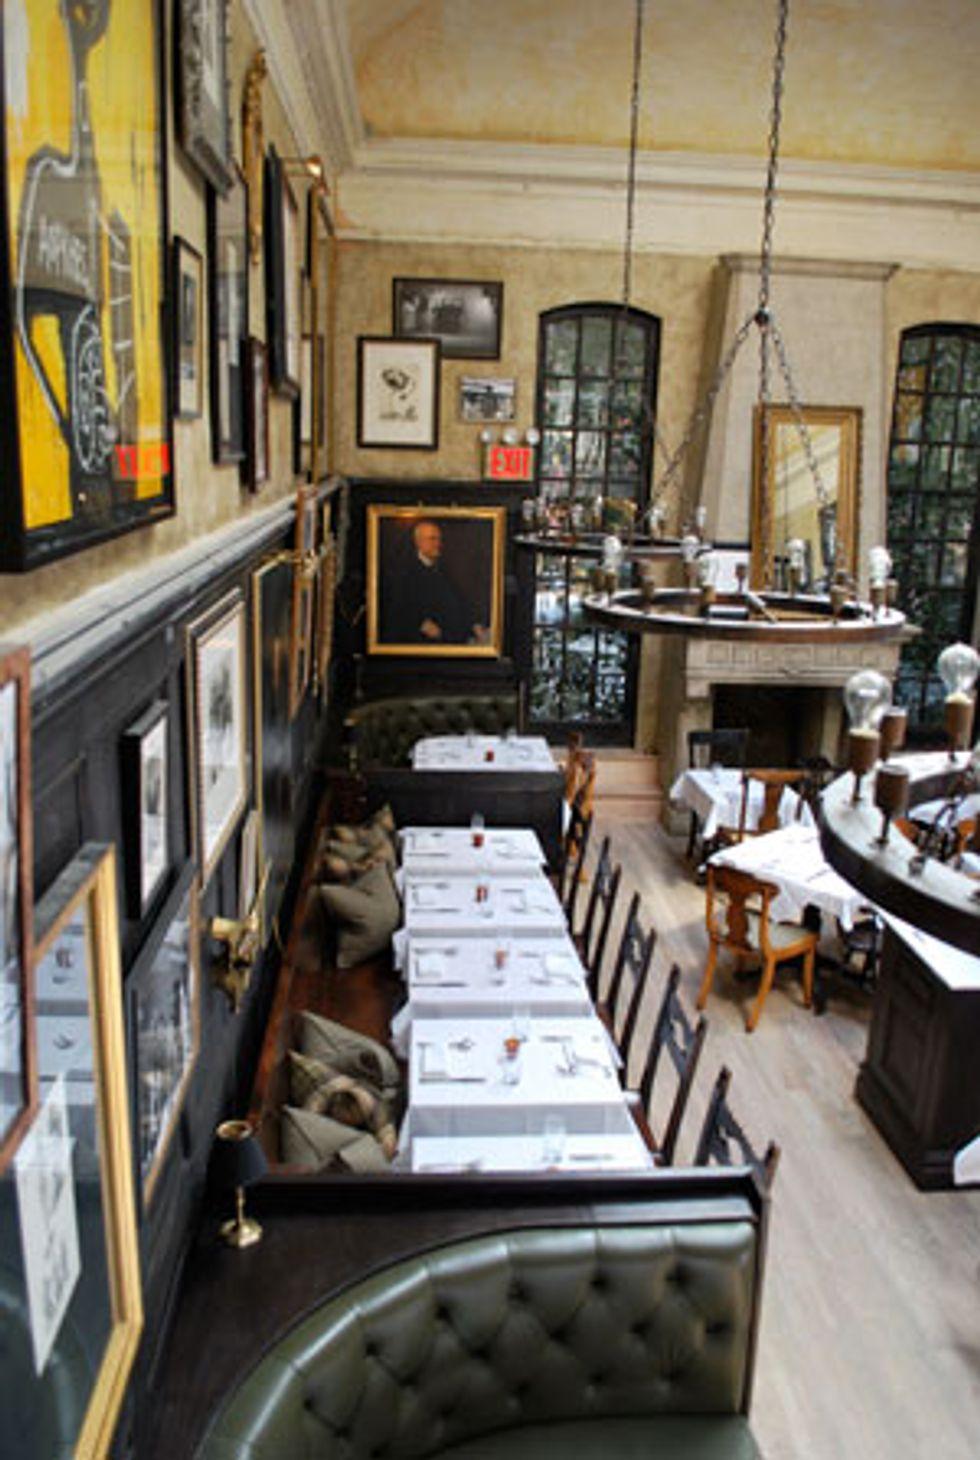 Restaurant Review: The Lion